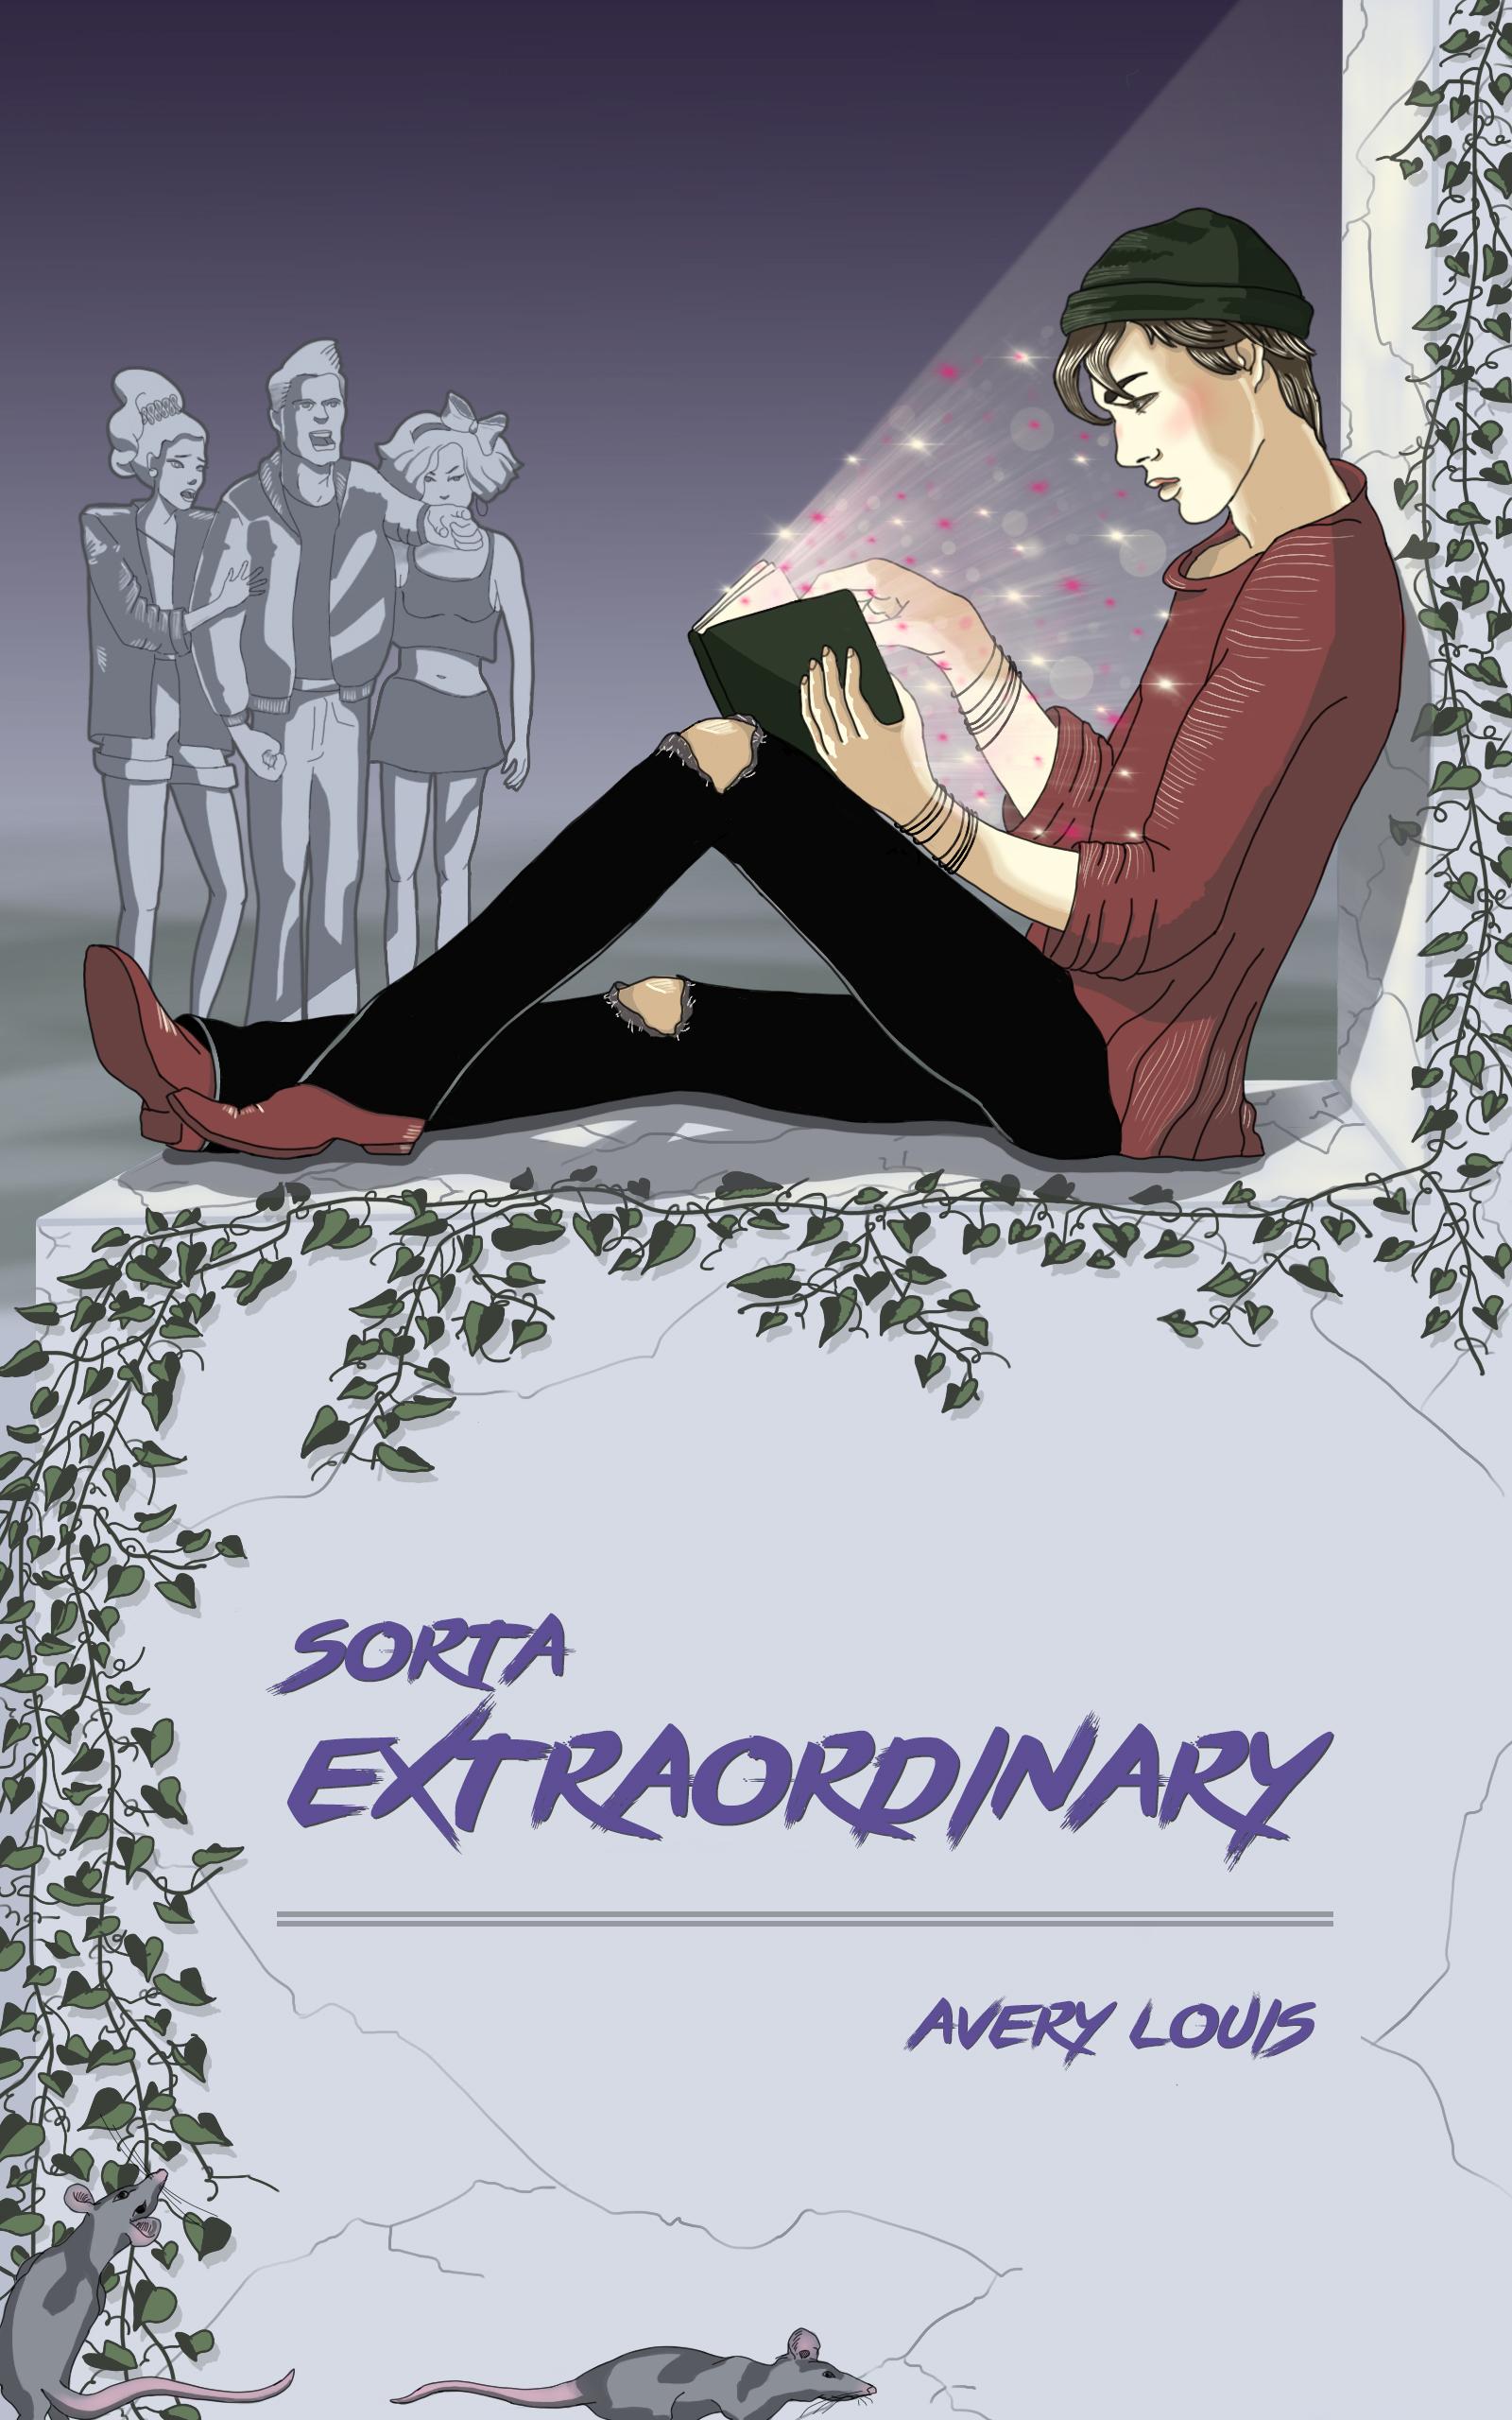 sorta_extraordinary_3.jpg